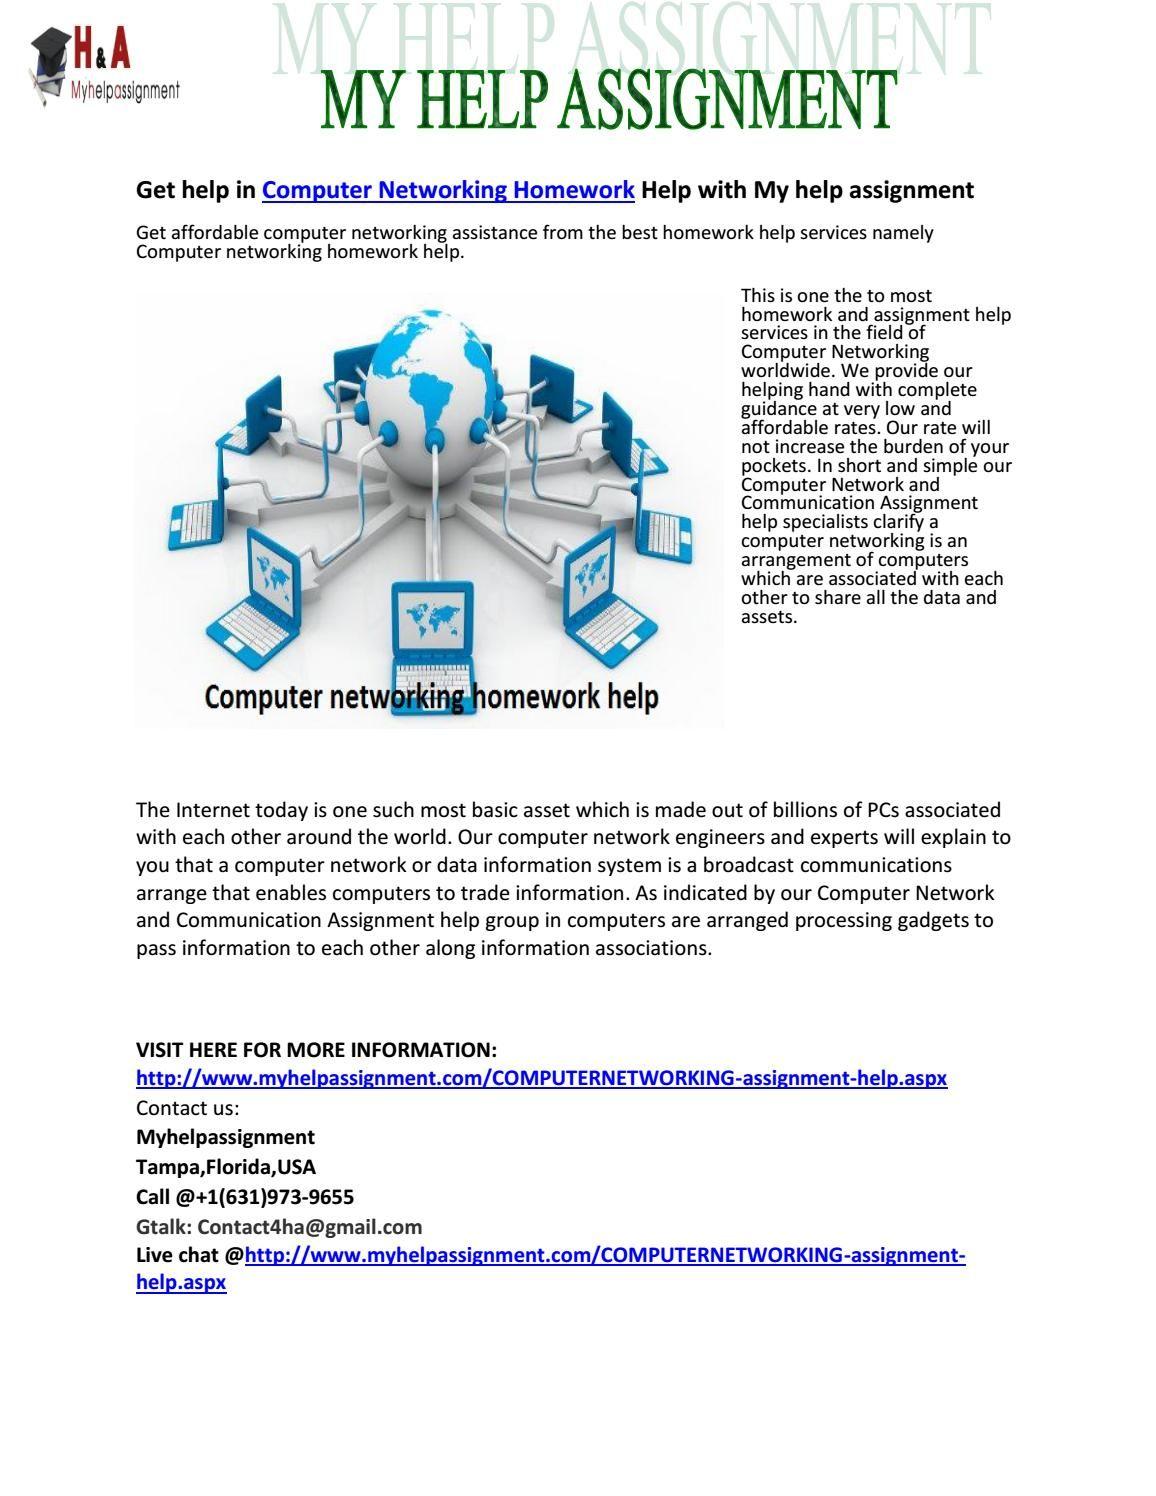 We are CompNetworkHelp.com